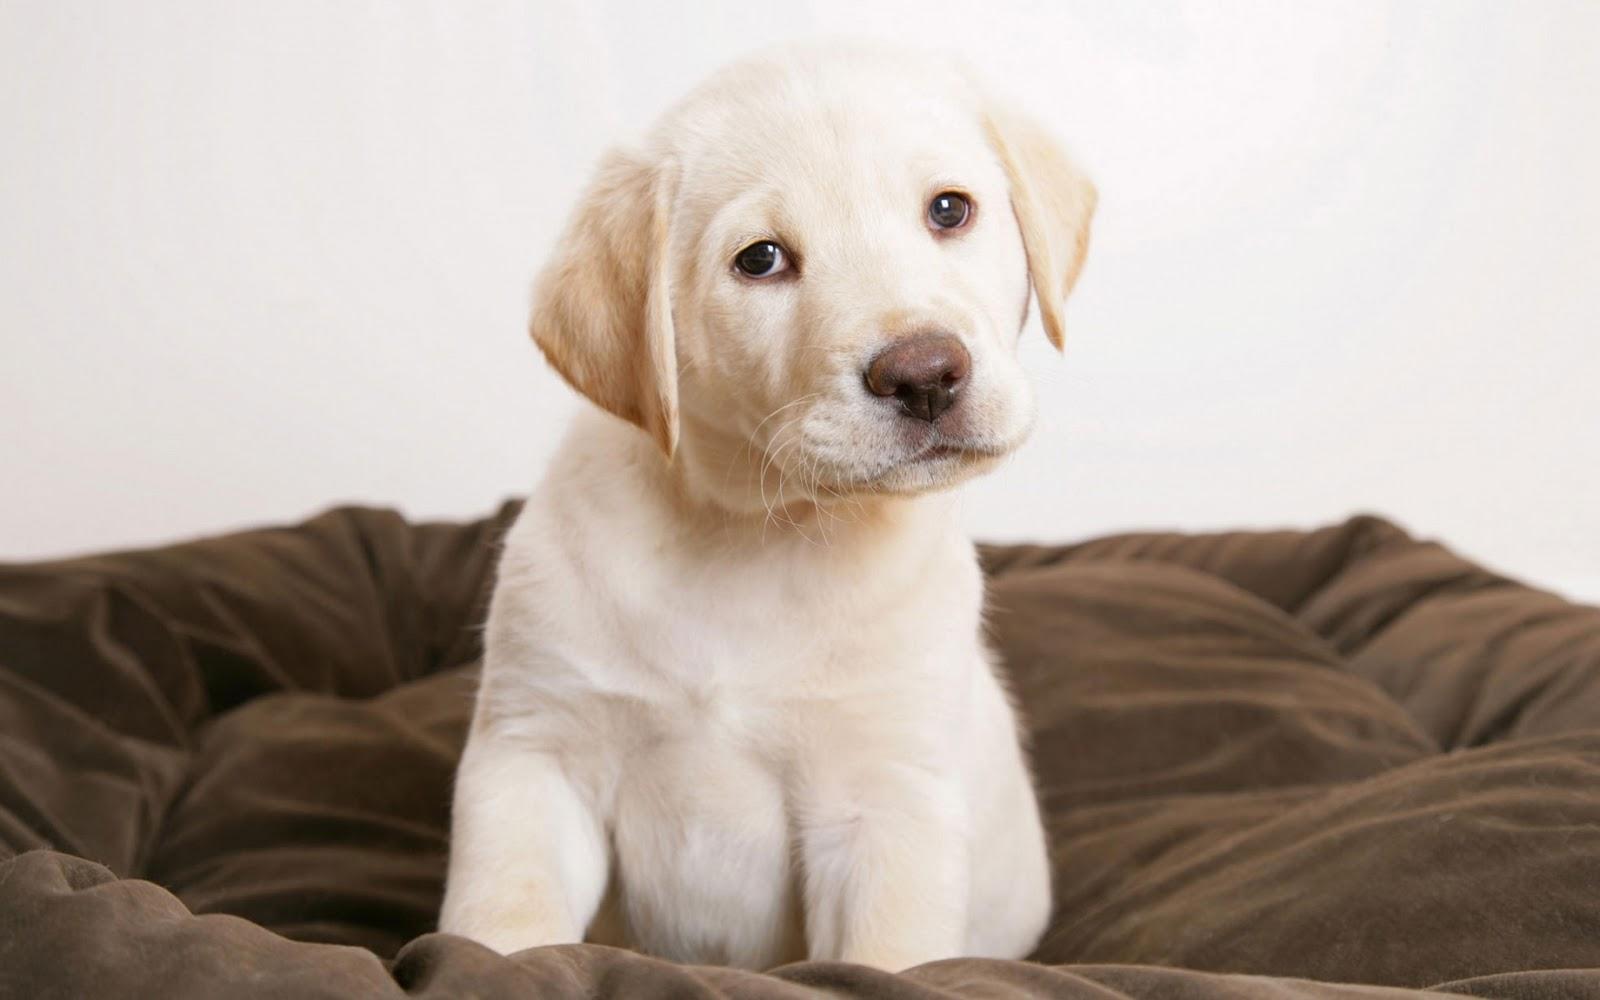 Cute Labrador Puppies Wallpapers Golden Retriever Puppies Hd Hd Desktop Wallpapers 4k Hd